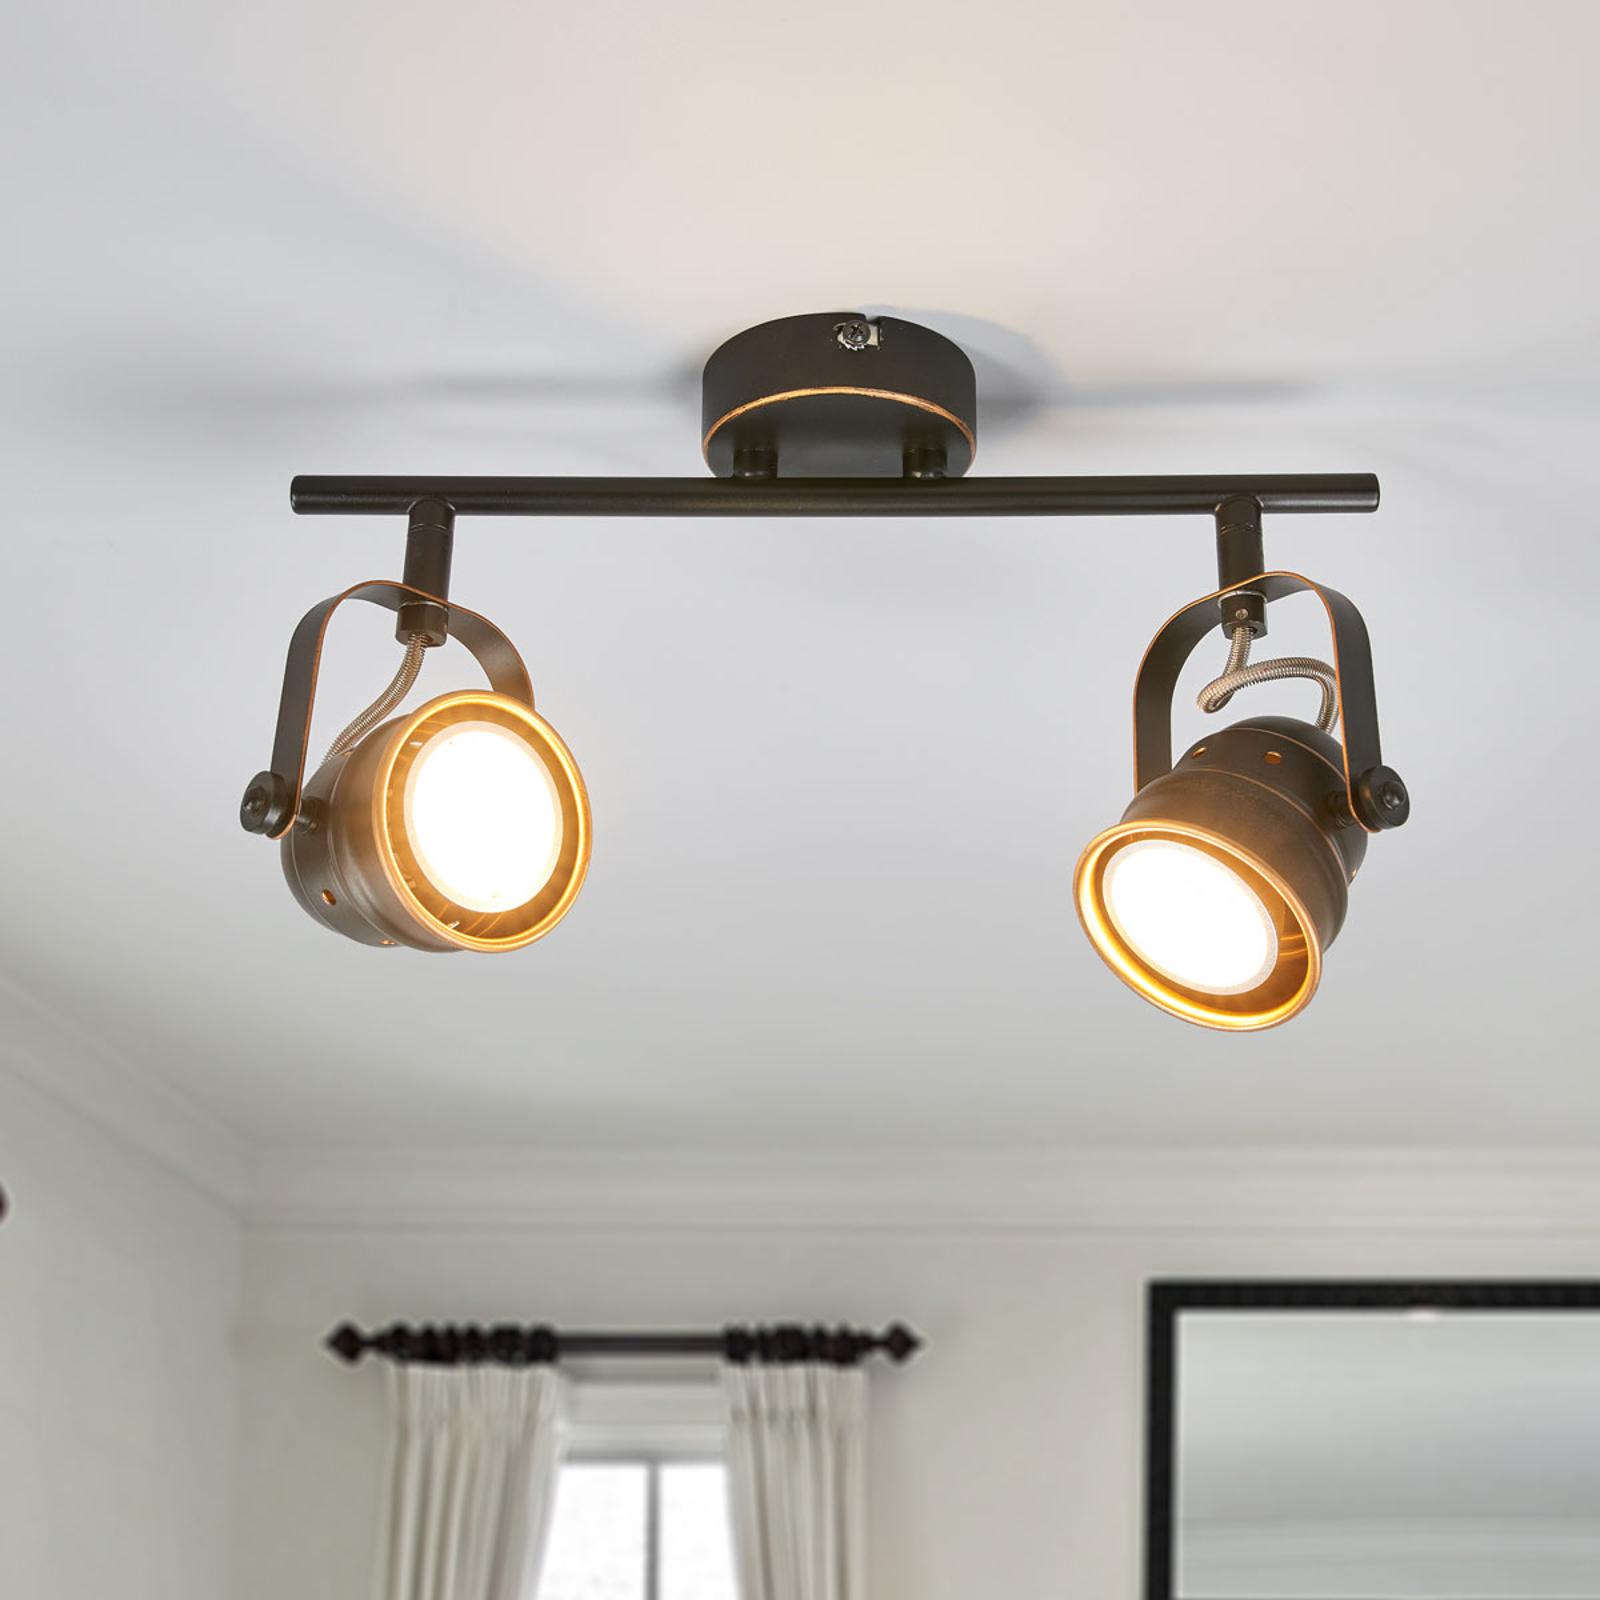 GU10-LED plafondlamp Leonor, zwart en goud